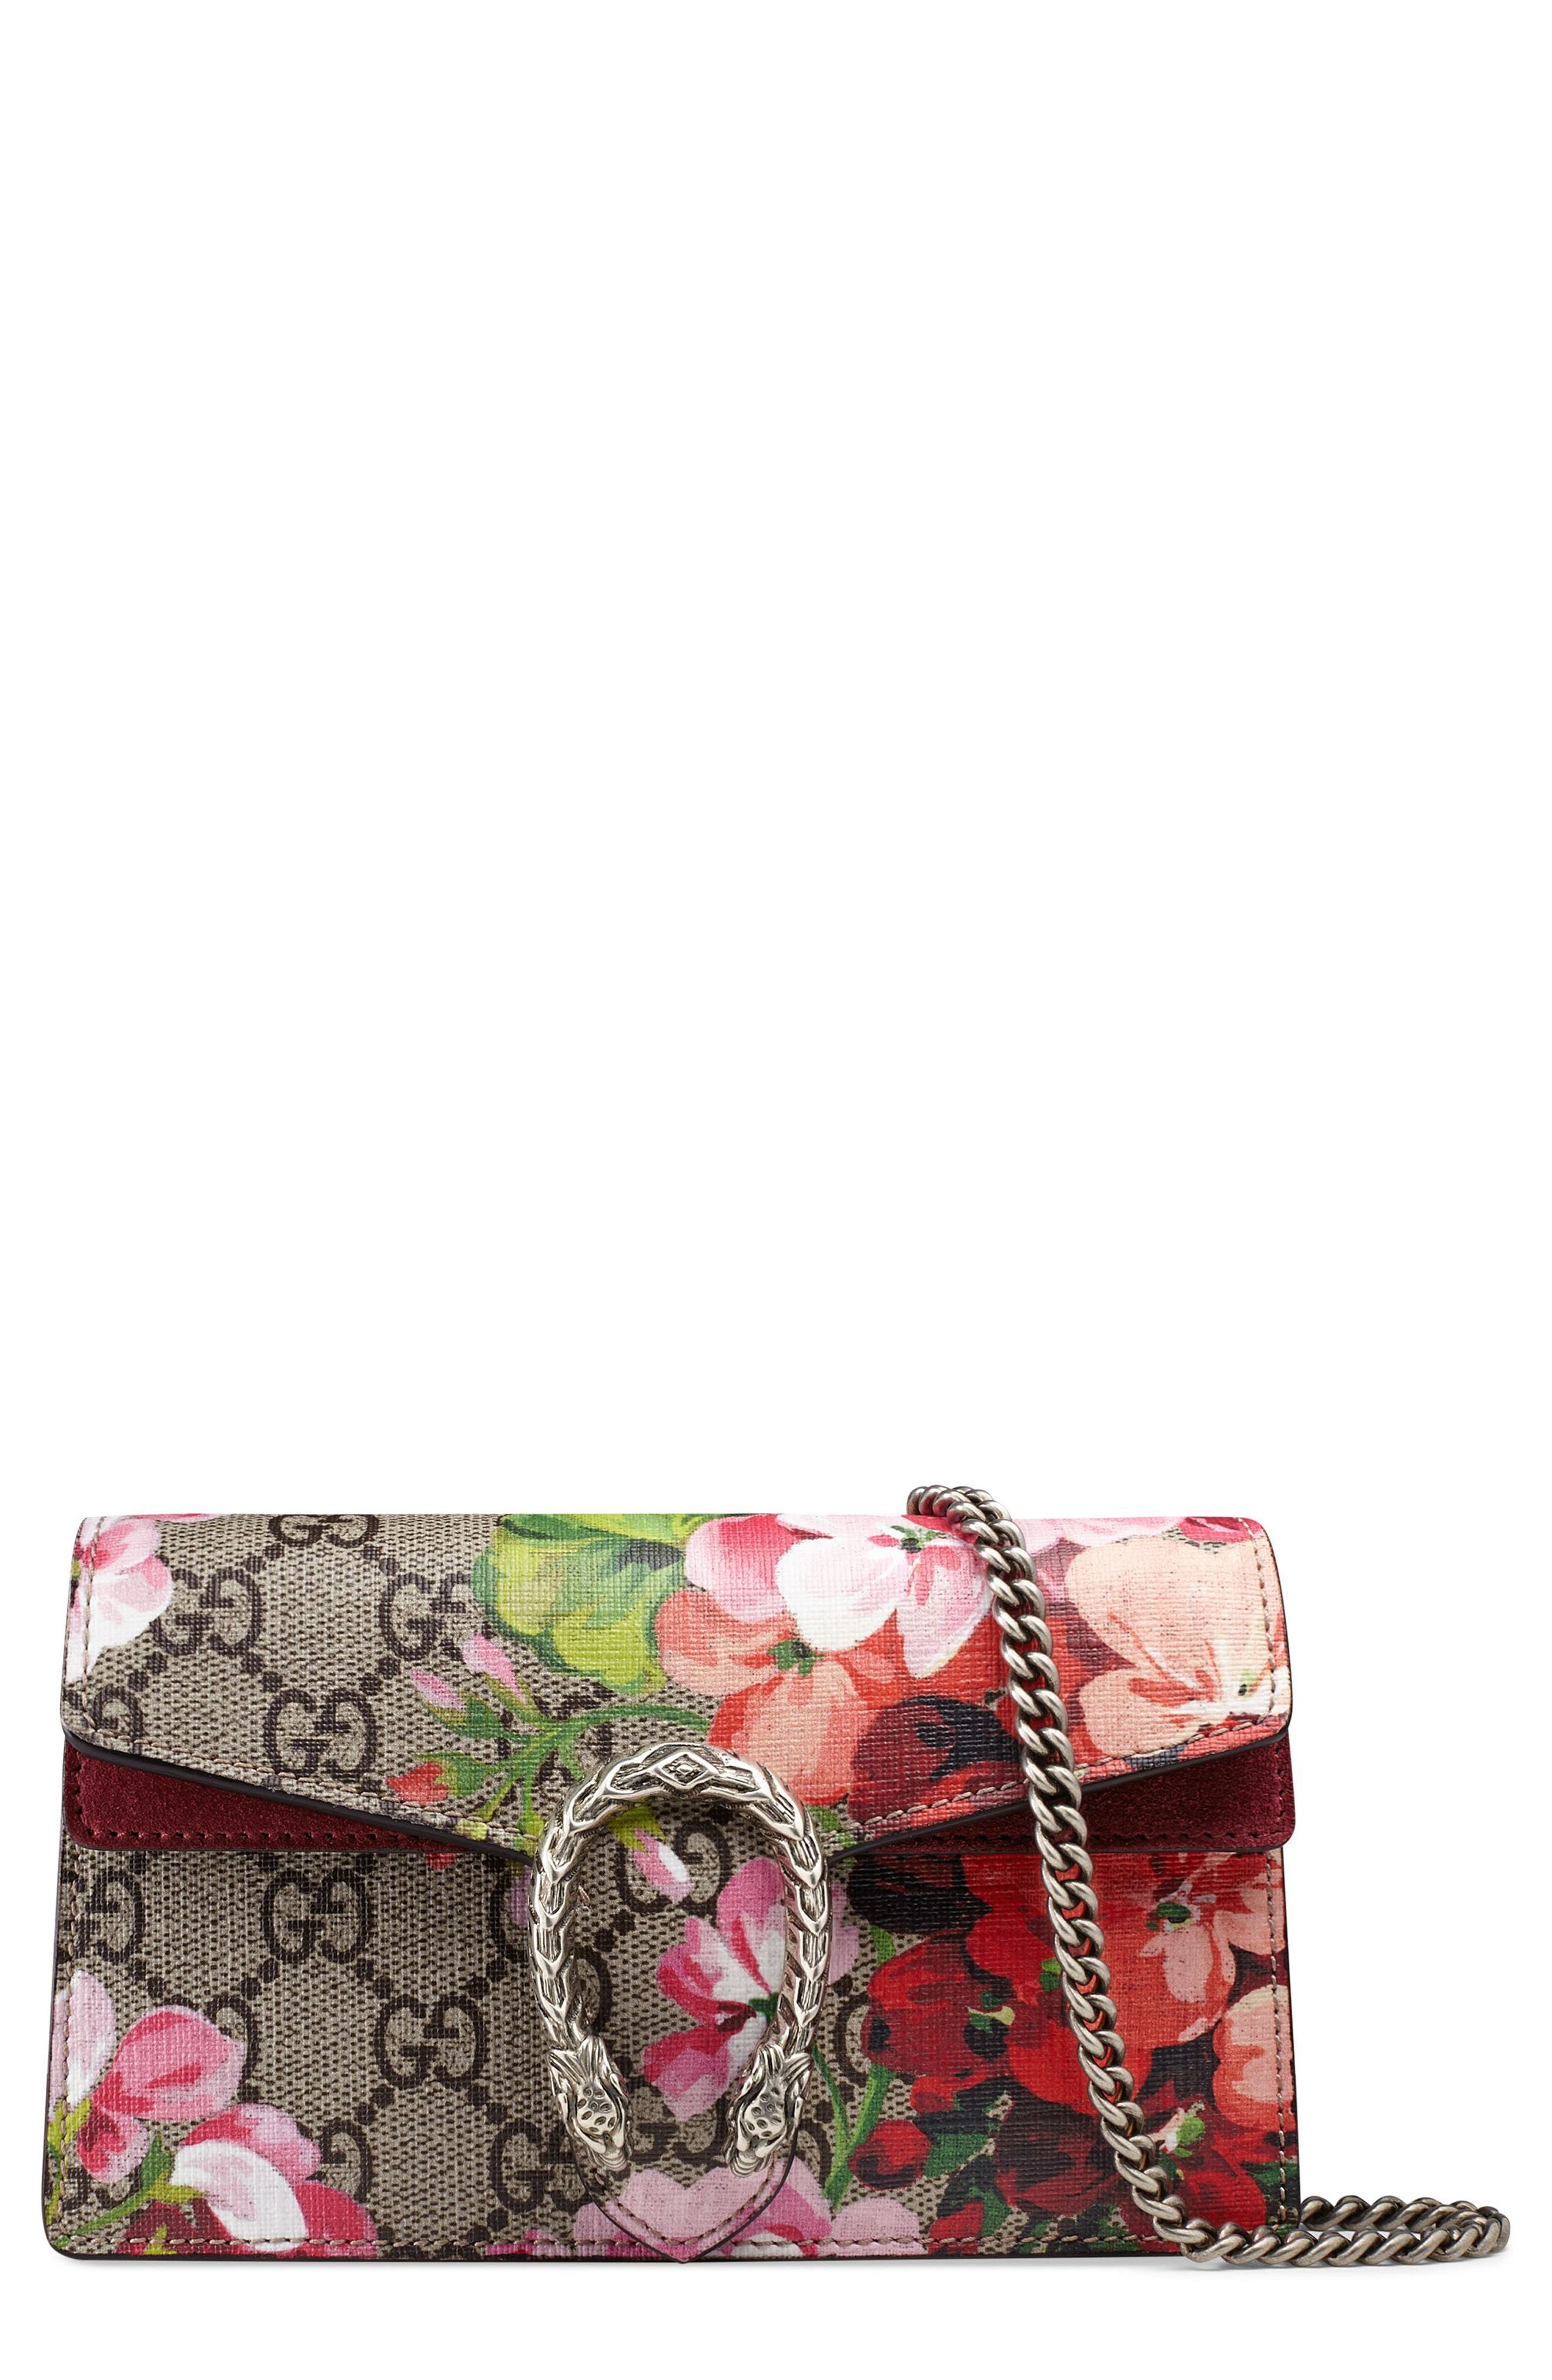 Main Image - Gucci Super Mini Dionysus GG Blooms Canvas Shoulder Bag